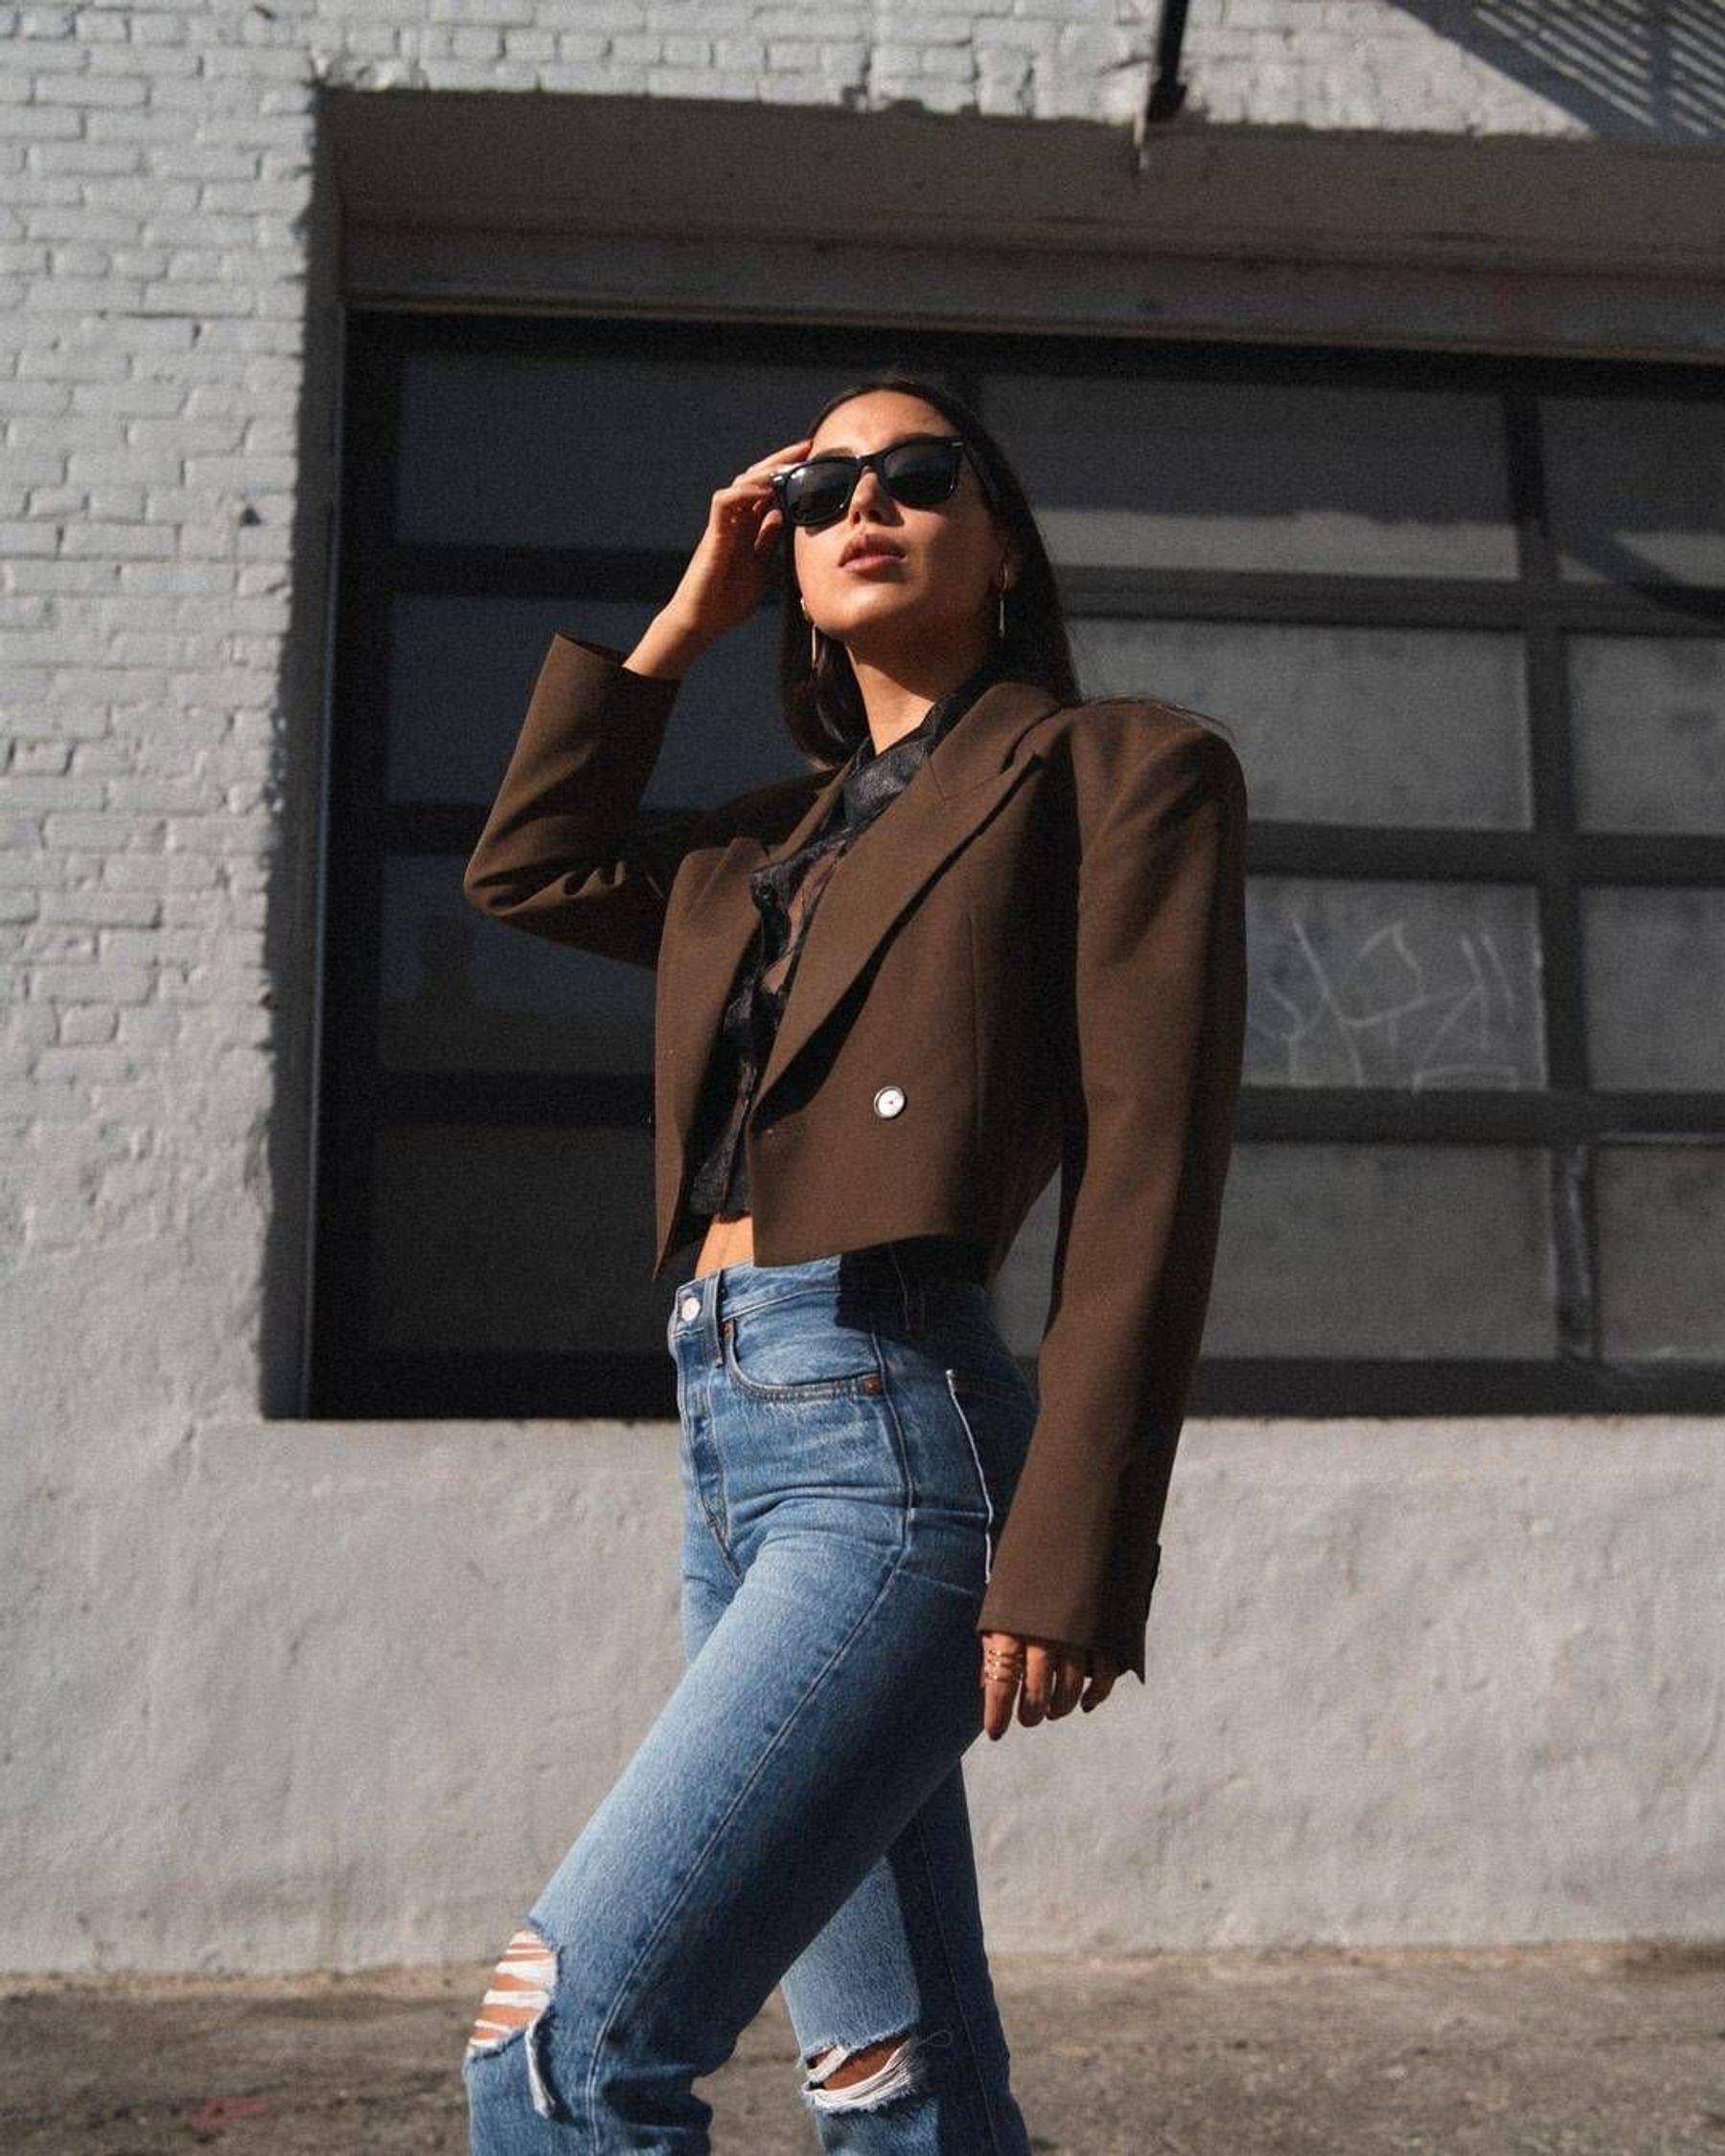 Phối quần jean với áo thun croptop tay dài